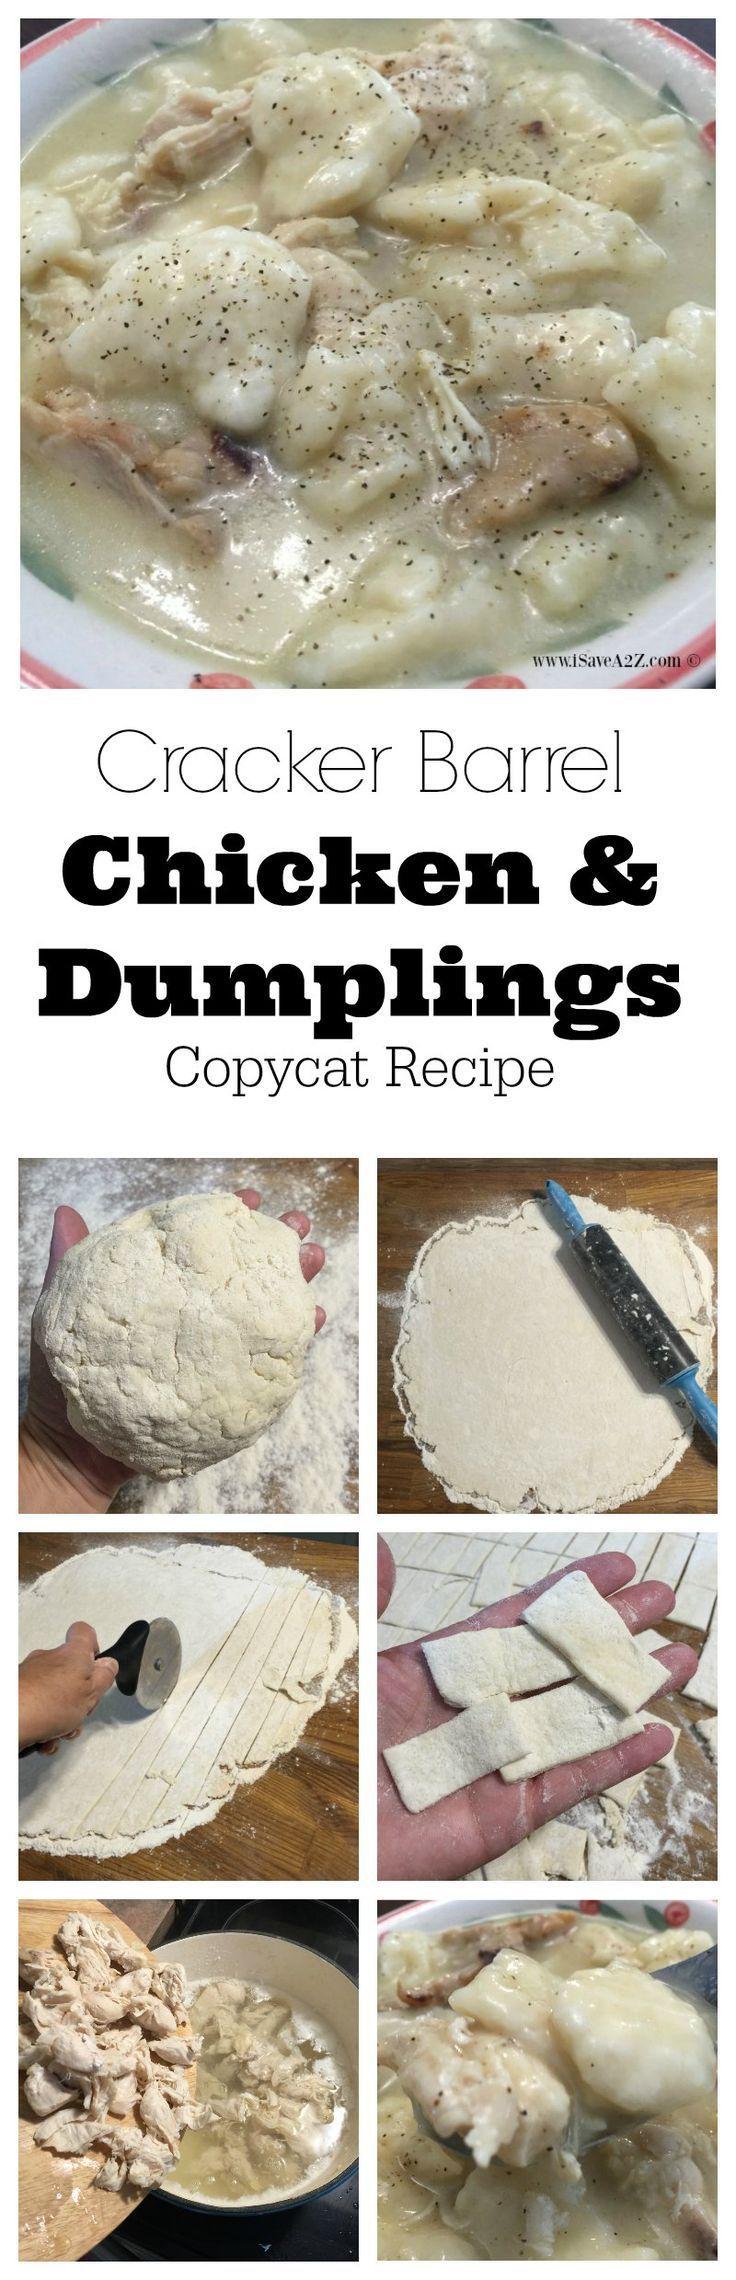 Cracker Barrel Chicken and Dumplings Copycat Recipe - iSaveA2Z.com (Favorite Food Chicken Soups)